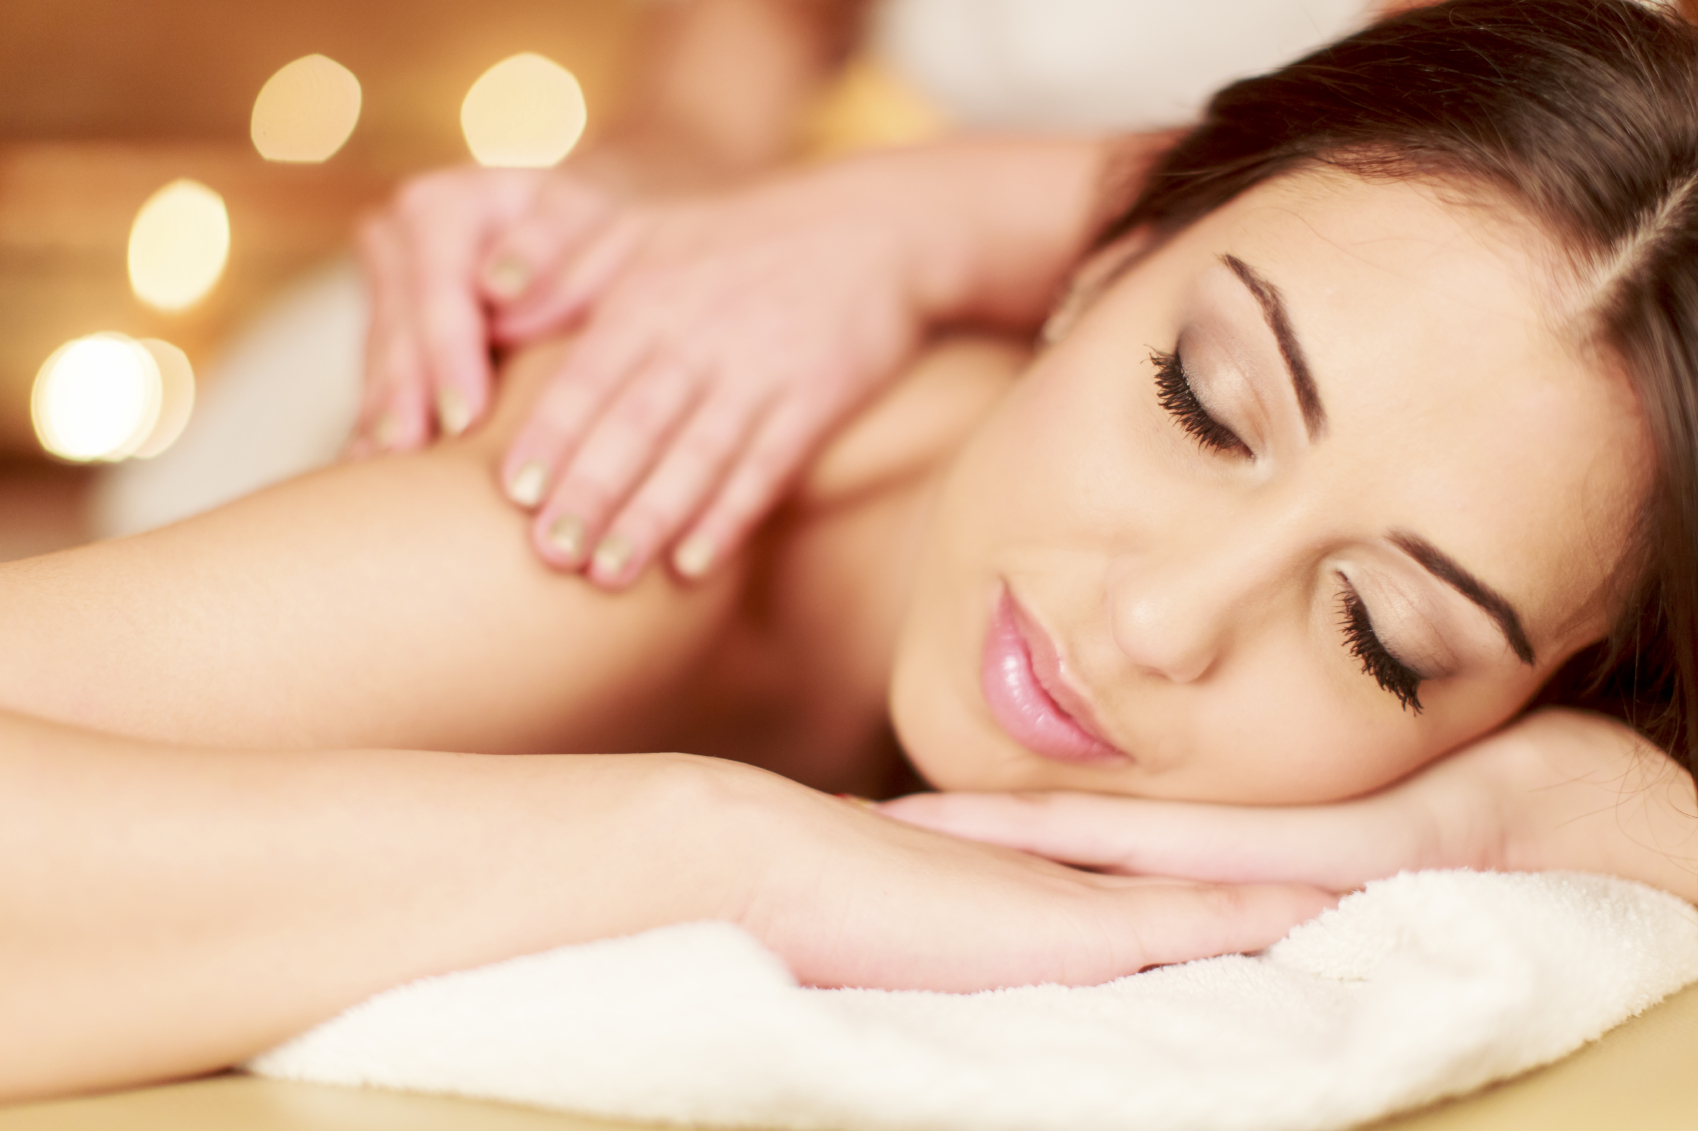 erotic massage argentina match personals